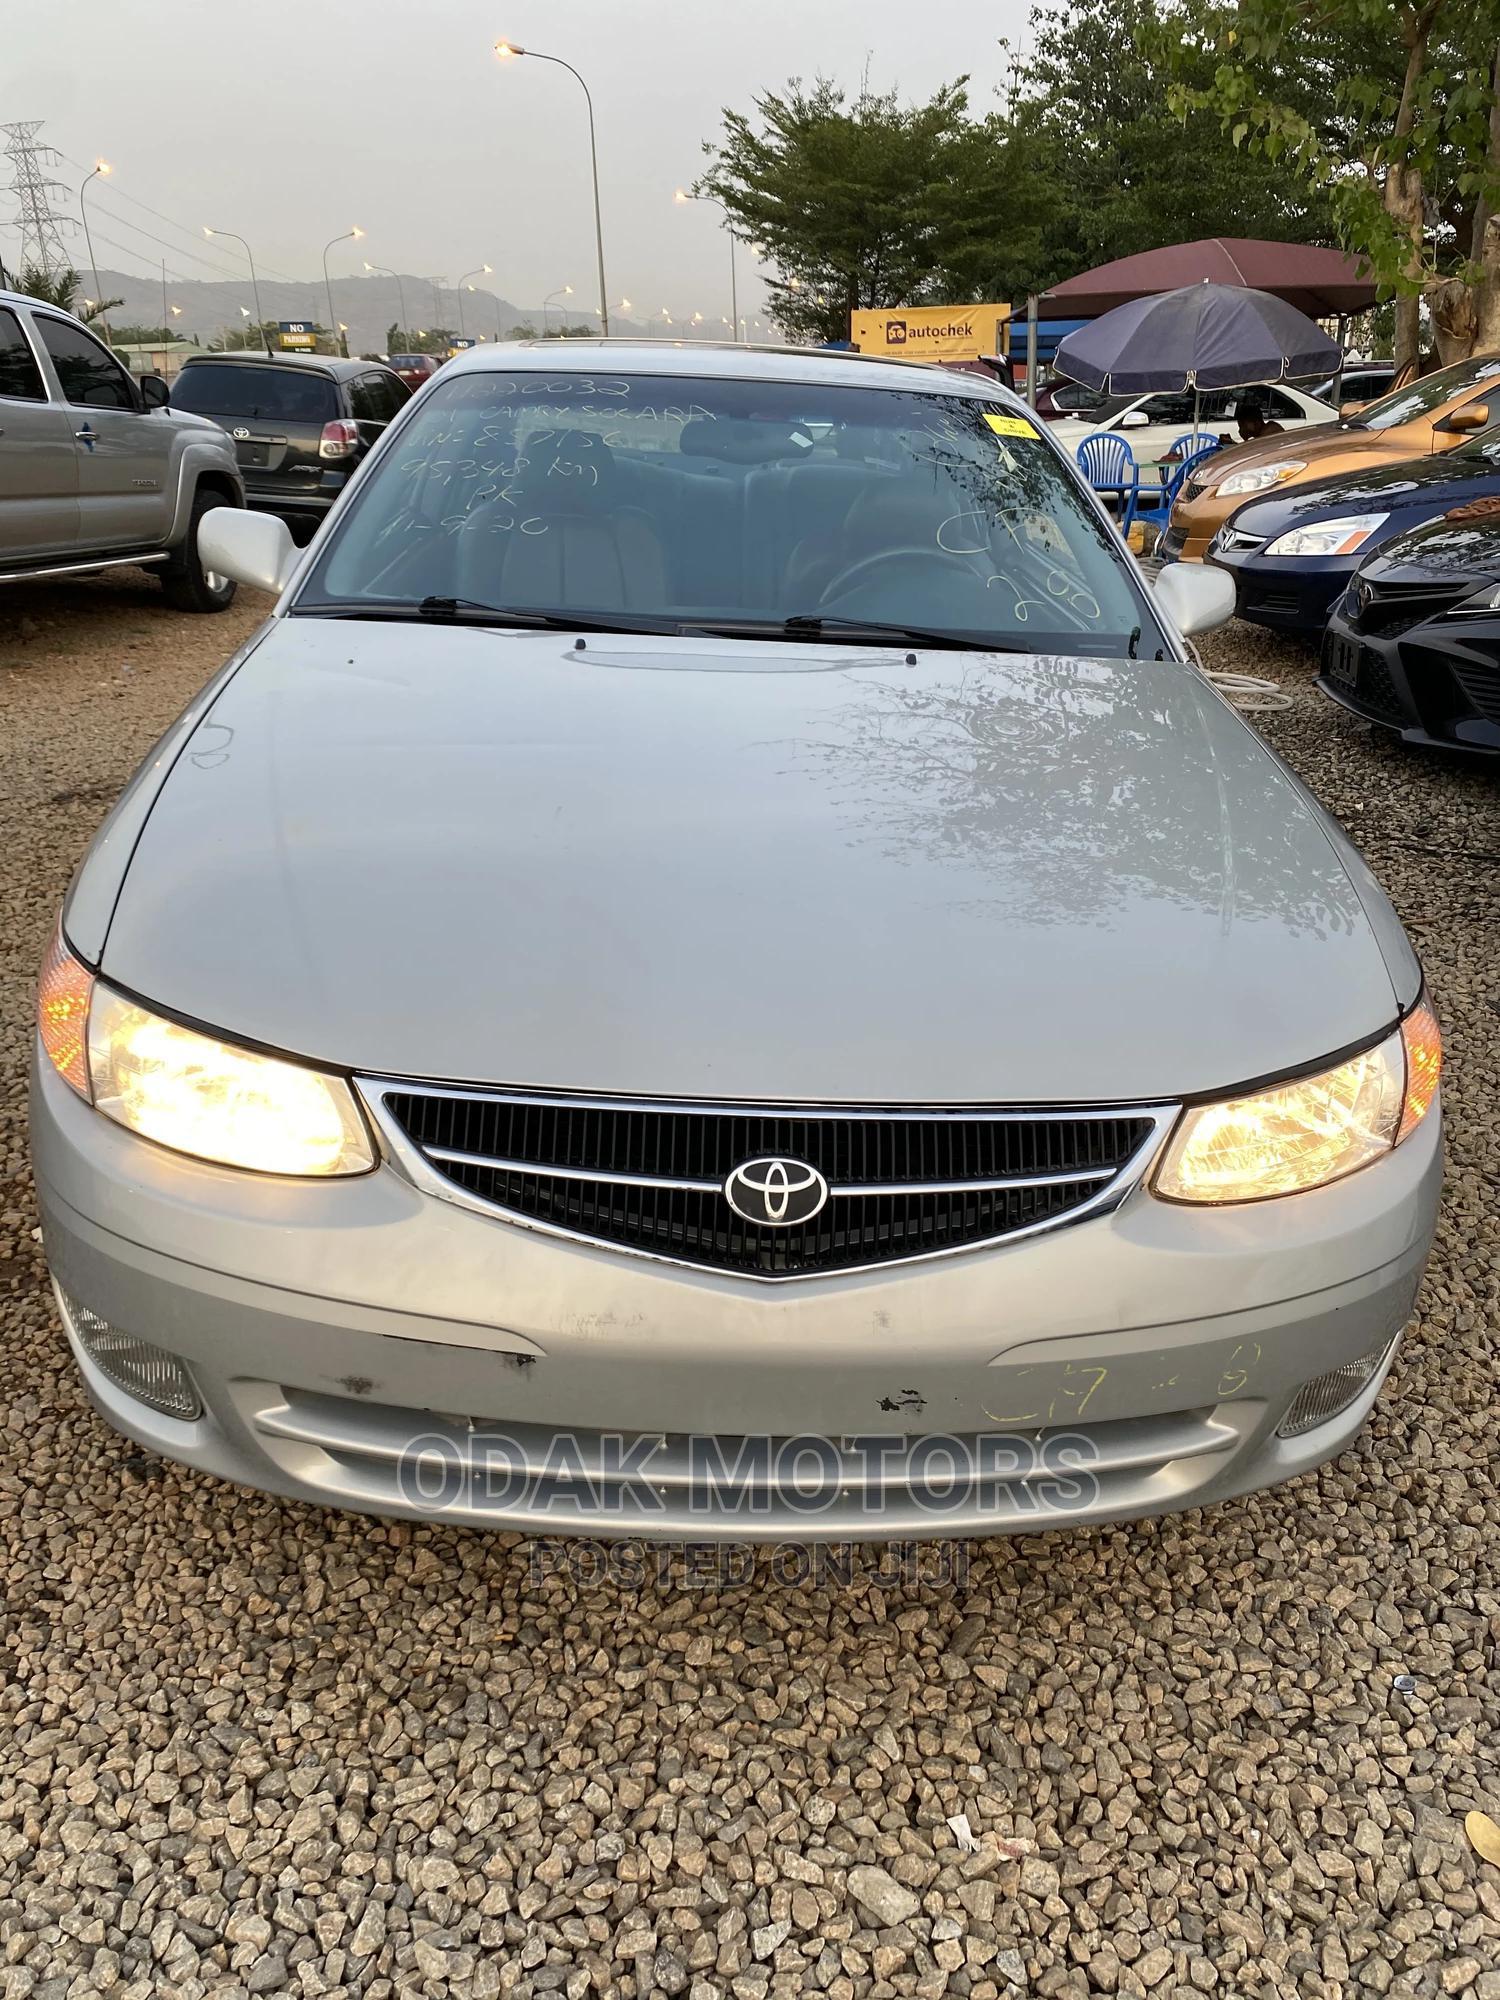 Toyota Solara 2002 | Cars for sale in Gwarinpa, Abuja (FCT) State, Nigeria